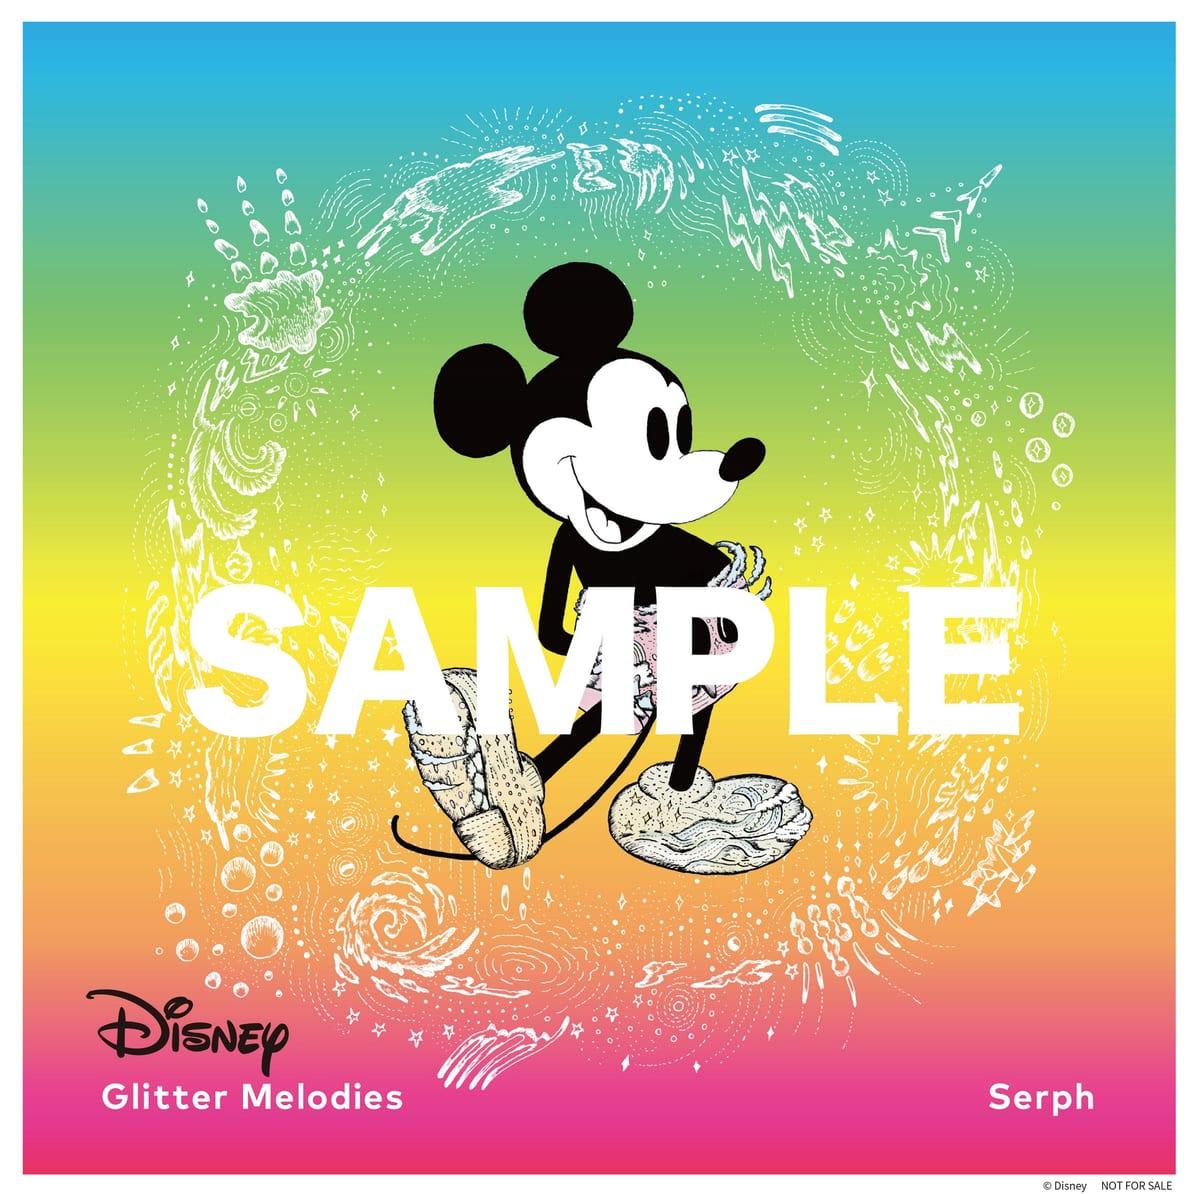 特典amazon sample_Disney Glitter Melodies_240x240